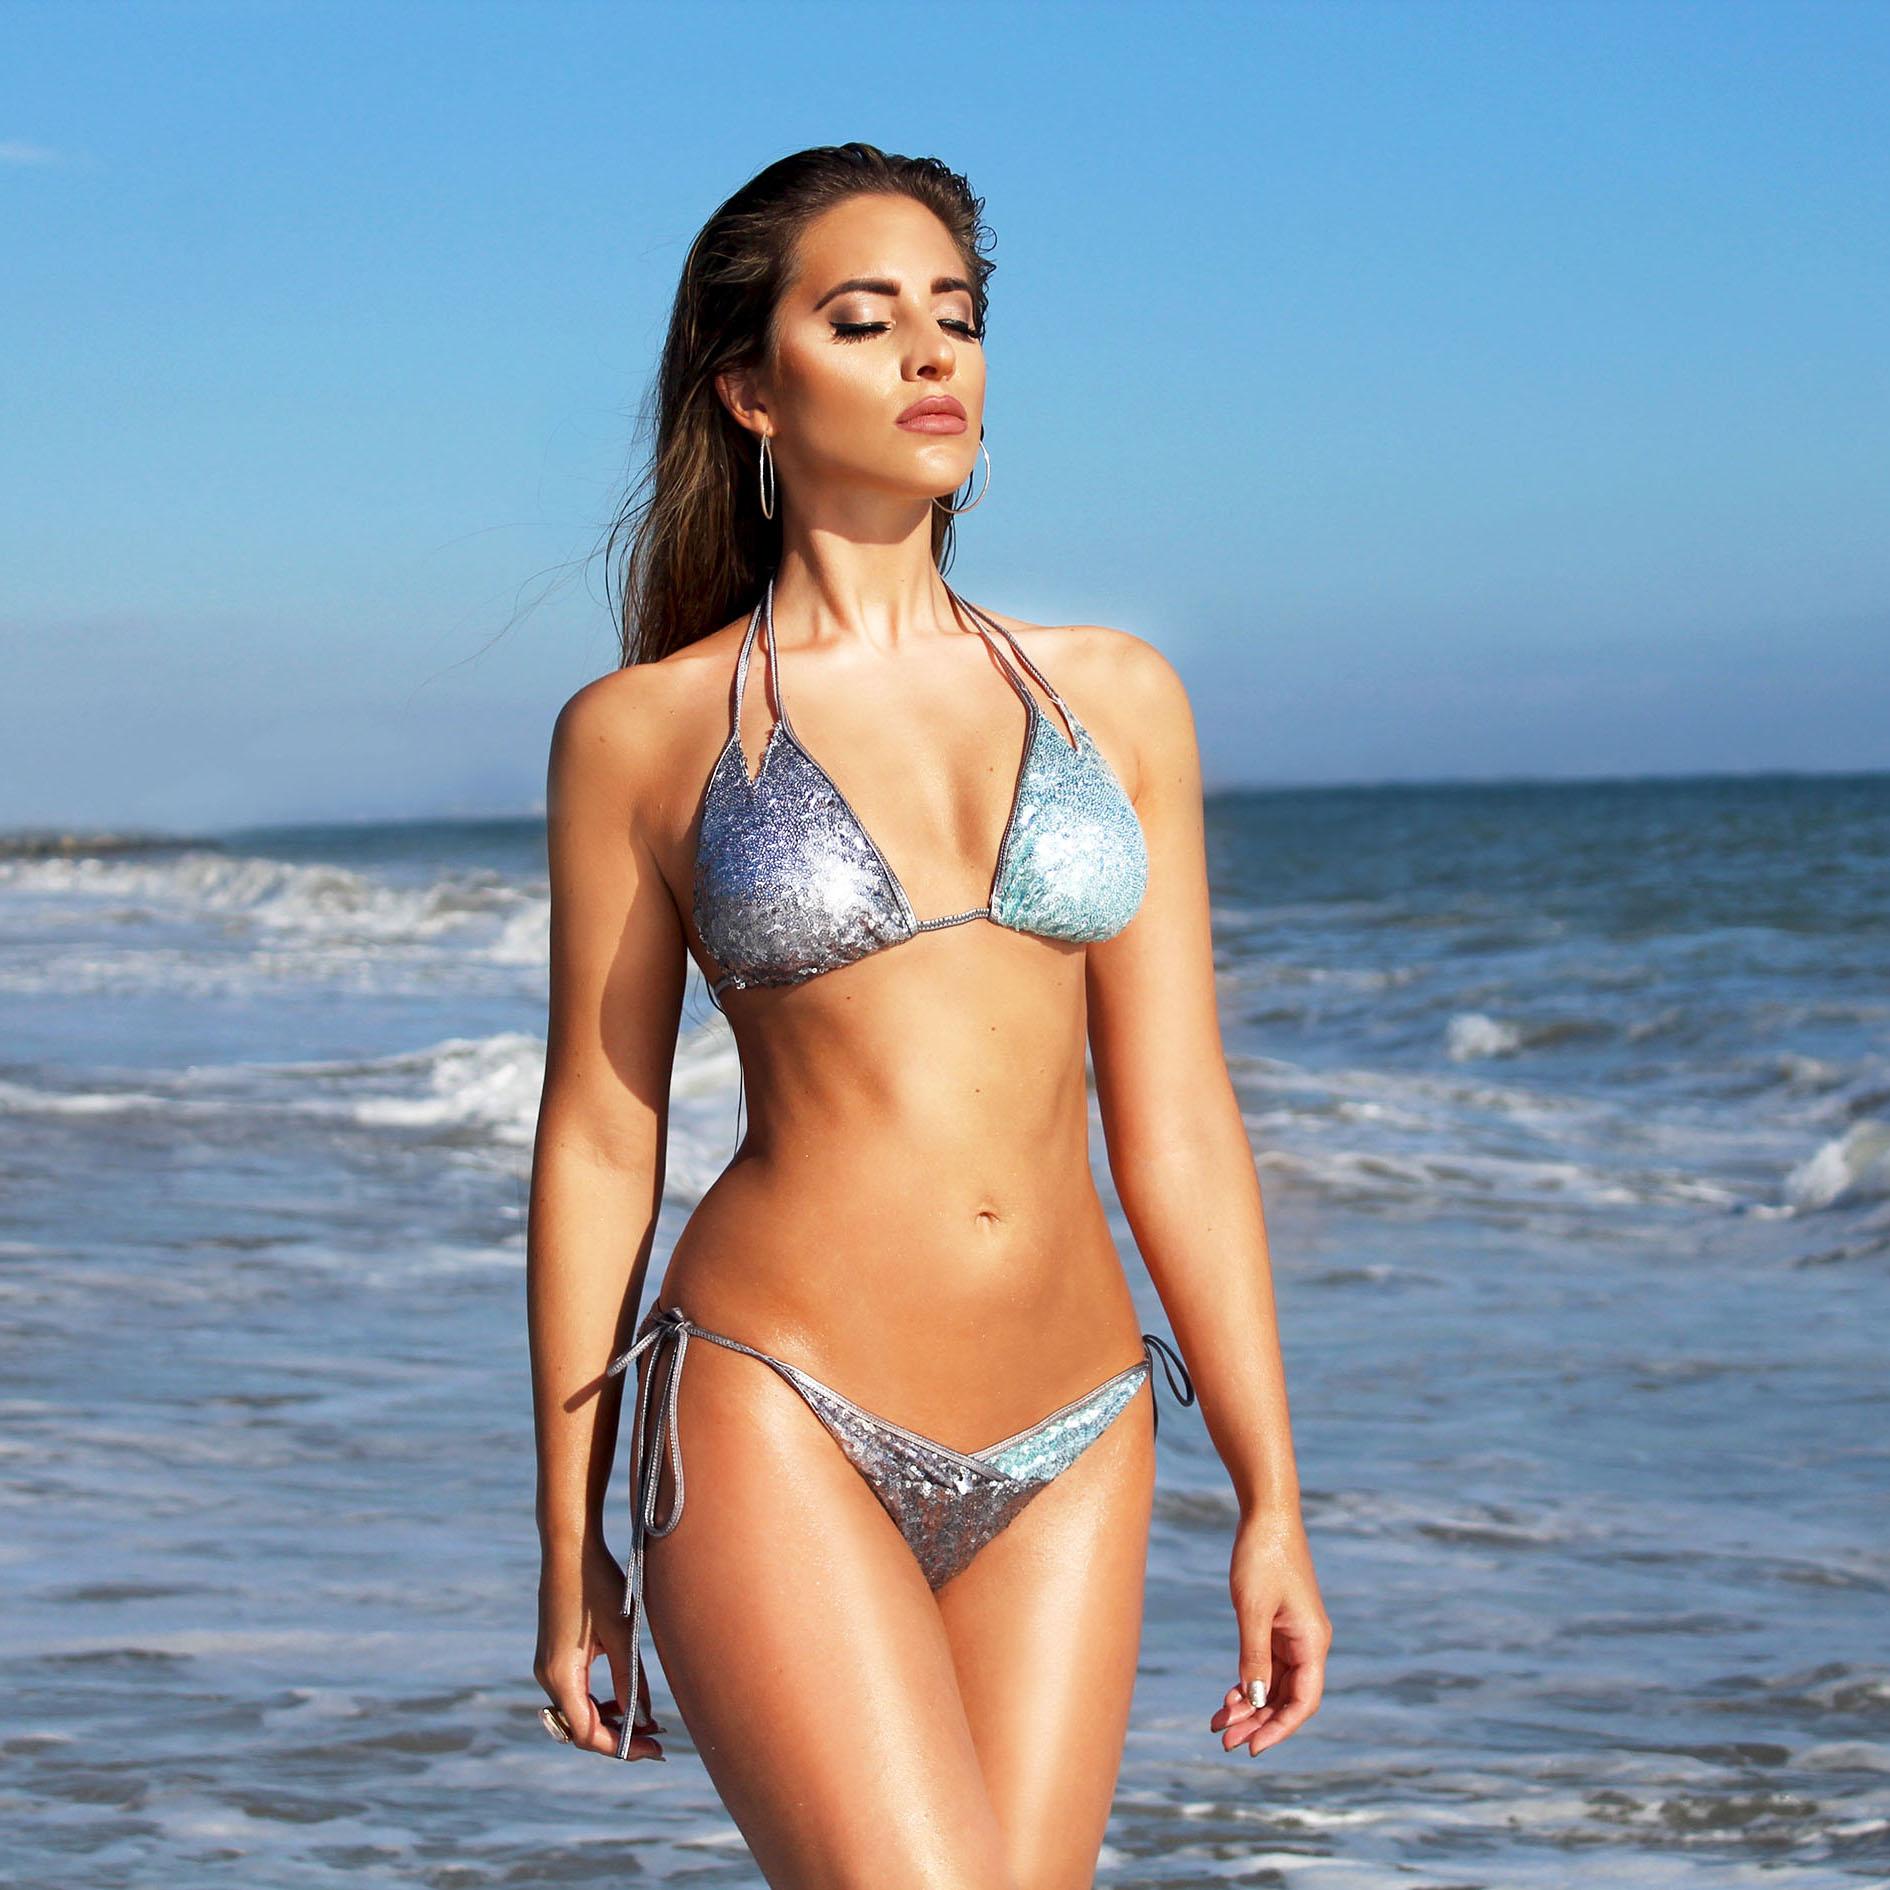 Black Friday Deals 2017 New Women Push-up Padded Bra Sequin Bandage Strap Bikini Set Swimsuit e Swimwear Bathing